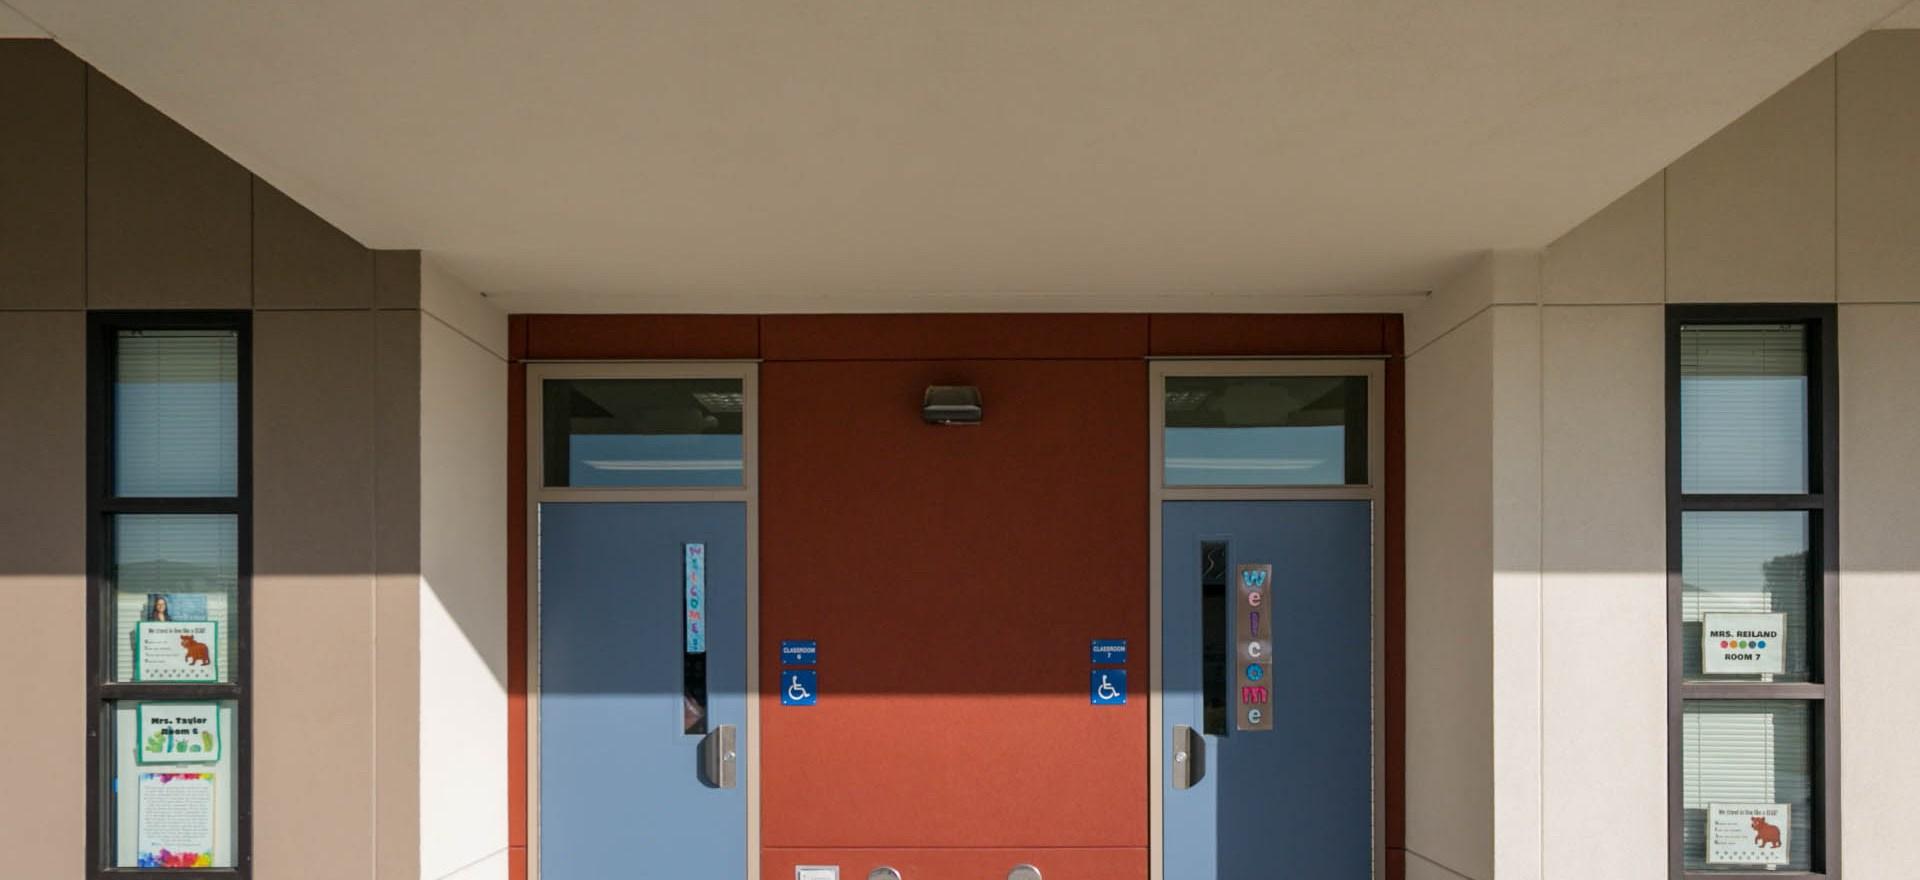 JTSModular-WhitleyElementarySchool-RobRijnenPhotography (10 of 36)